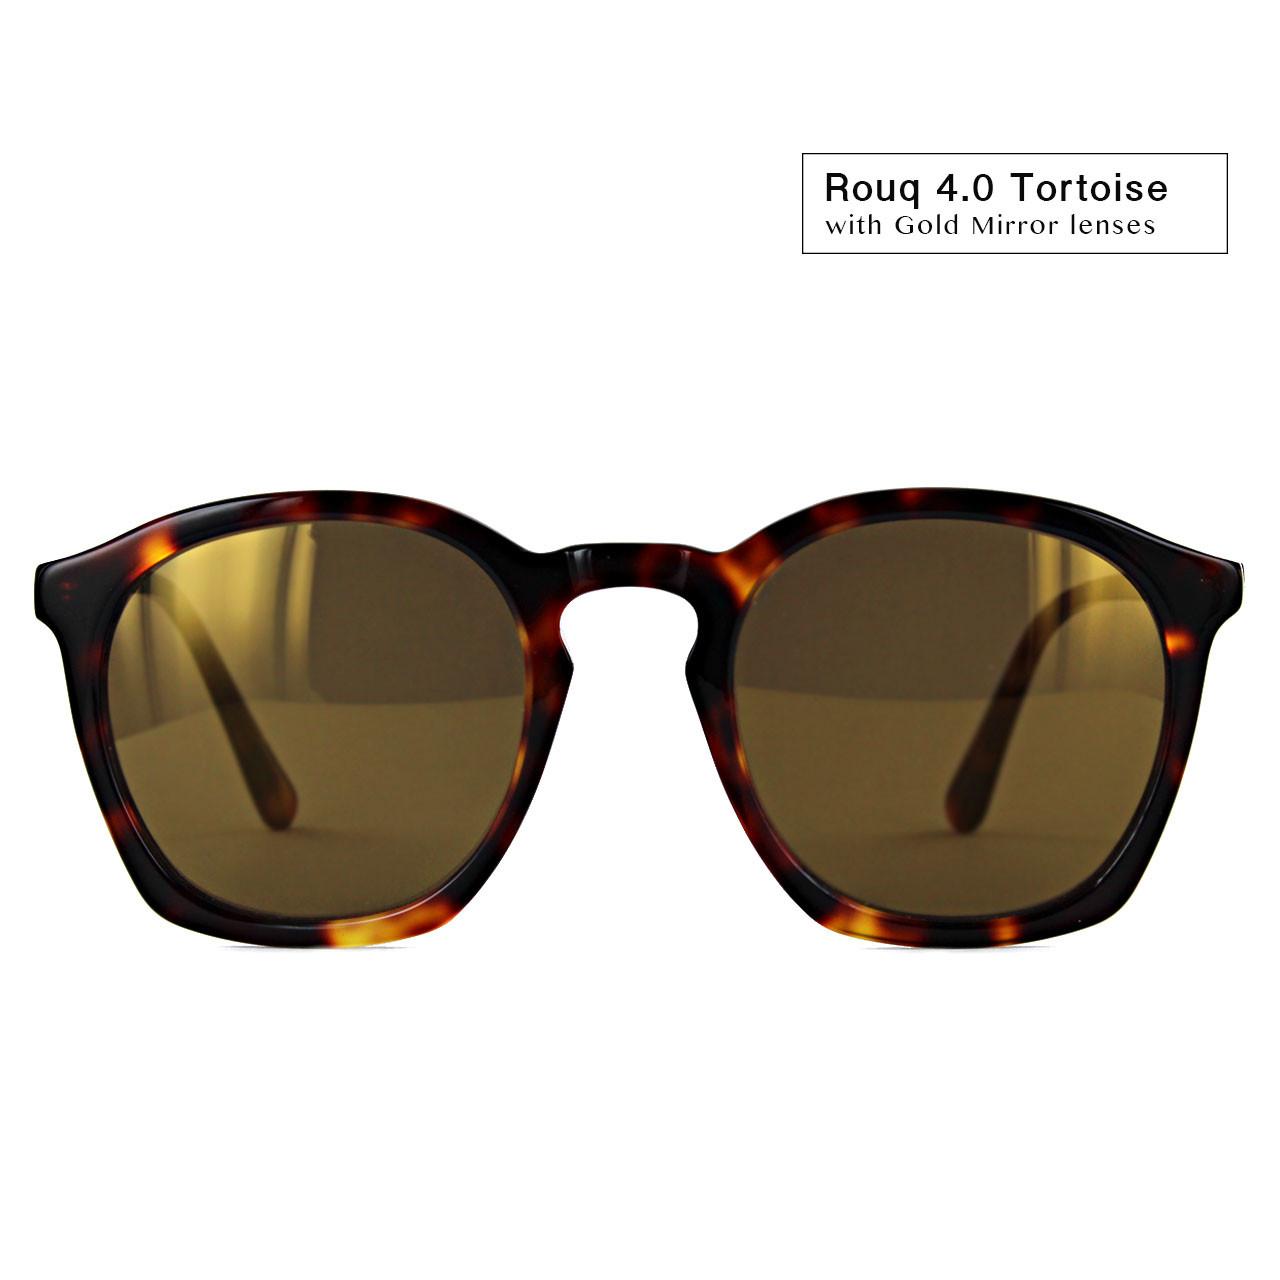 GEEK Eyewear Sunglasses with Gold Mirror Lenses